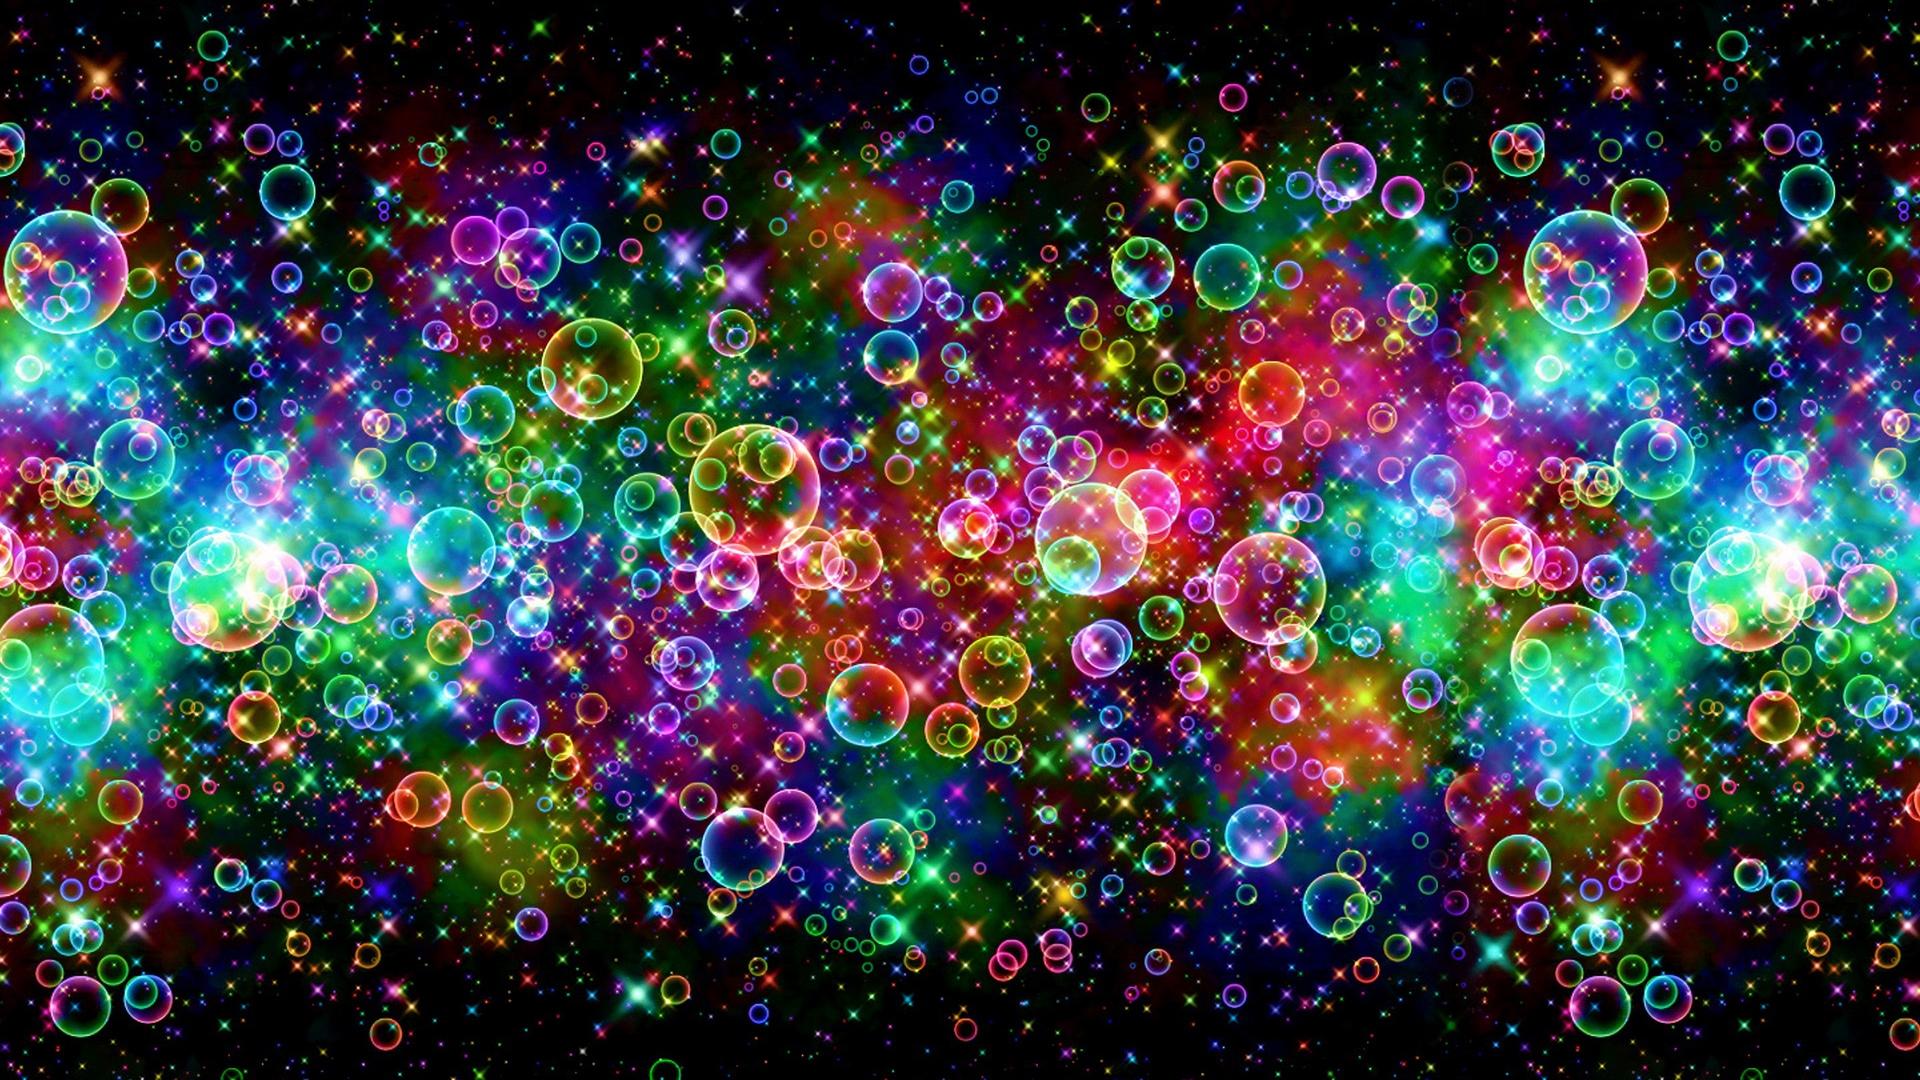 Colorful Wallpapers; Colorful Wallpapers; Colorful Wallpapers ...